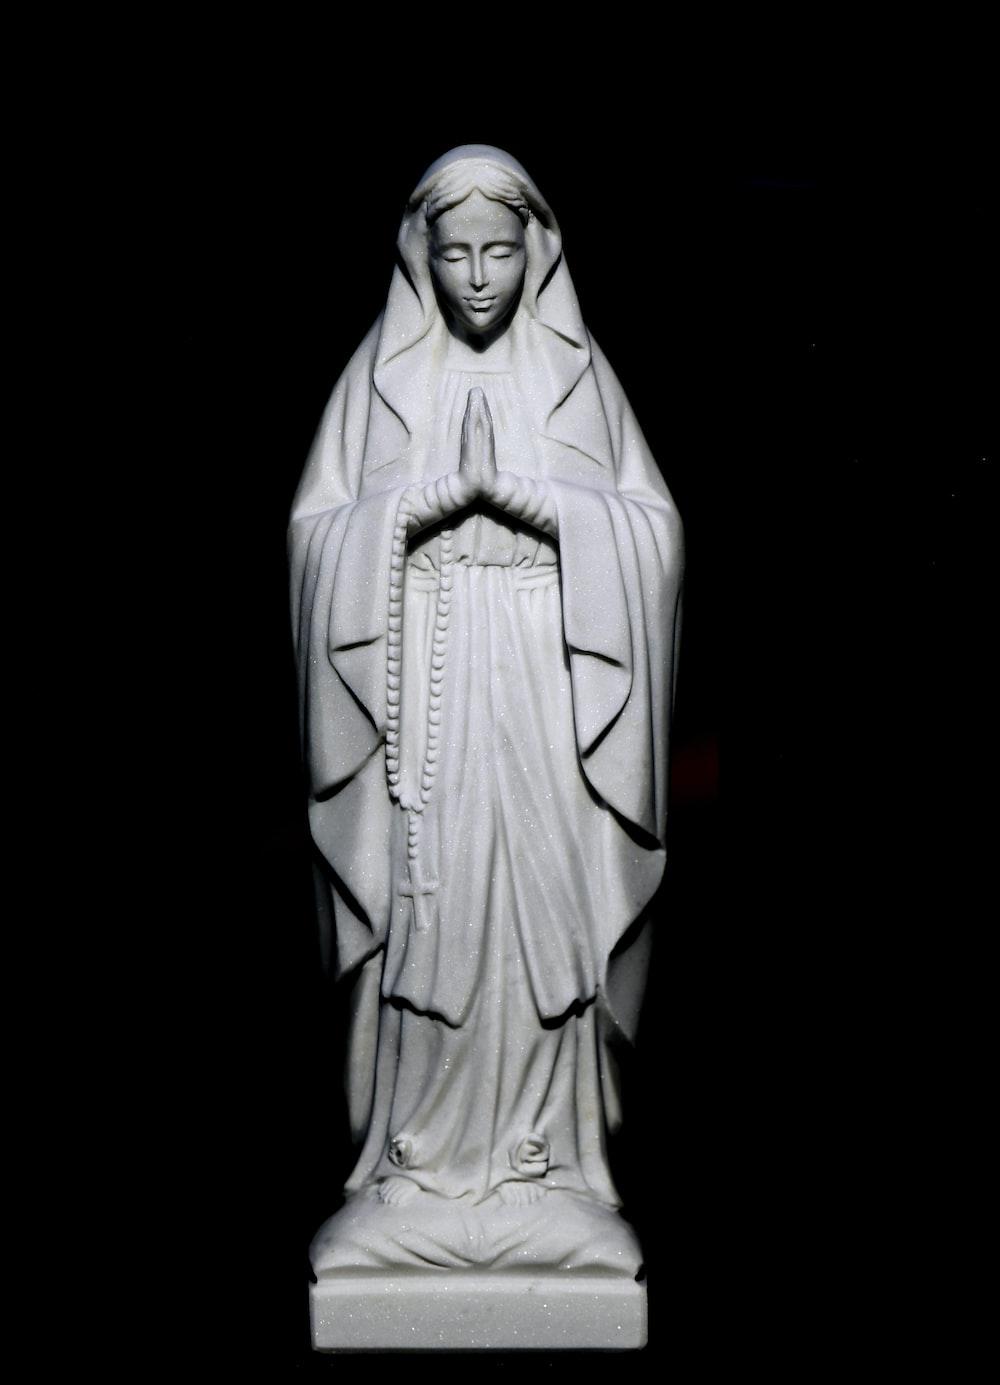 jesus christ on cross statue